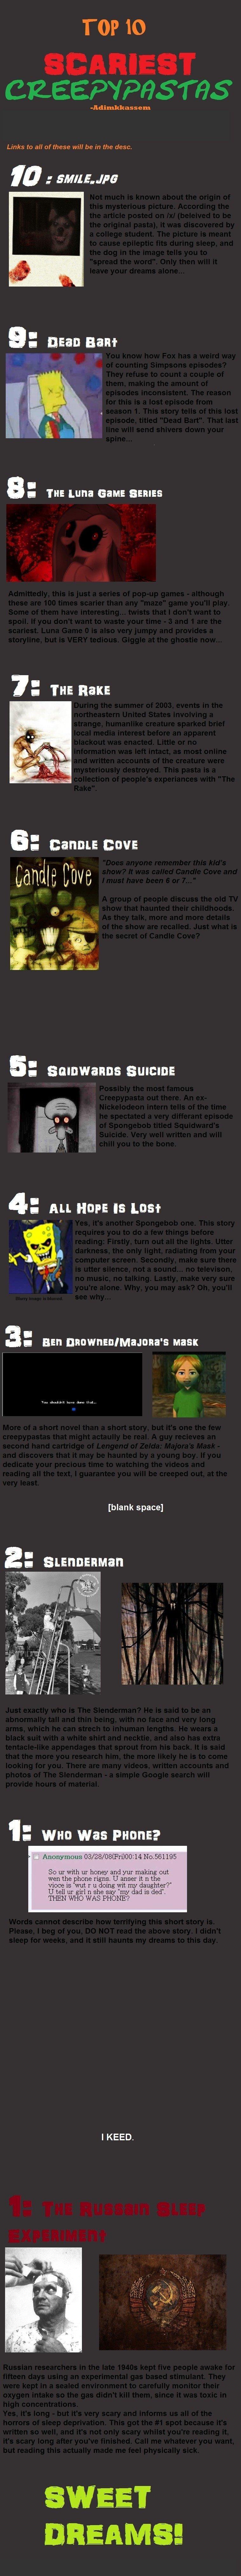 Top 10 Creepypasta's. Smile.jpg: knowyourmeme.com/memes/smilejpg#.Tquaed4r2so Dead Bart: creepypasta.wikia.com/wiki/Dead_Bart The Luna Game Series: knowyourmeme